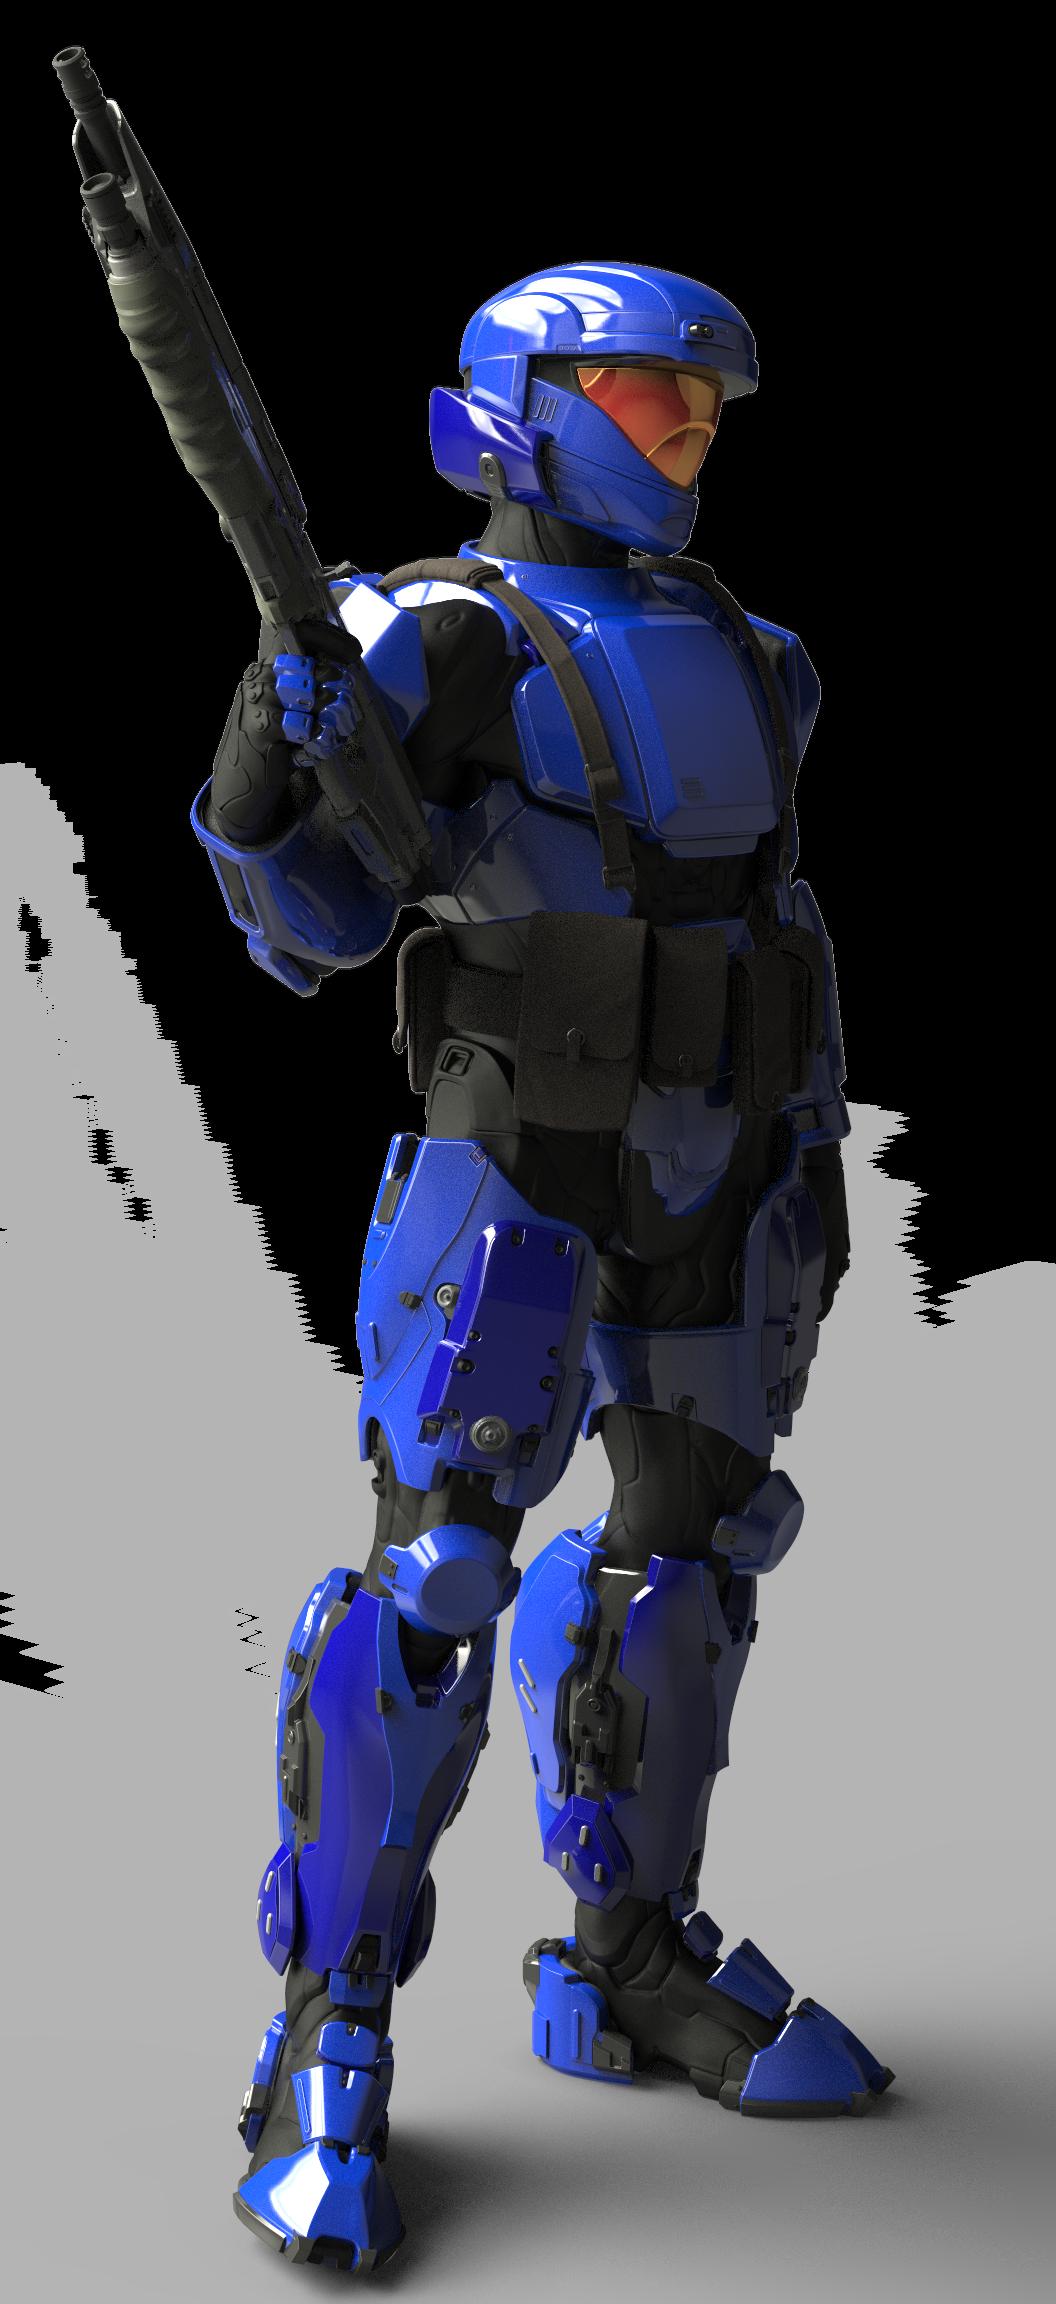 Nightfall Helmet Or Buck S Odst Helmet Halo 5 Guardians